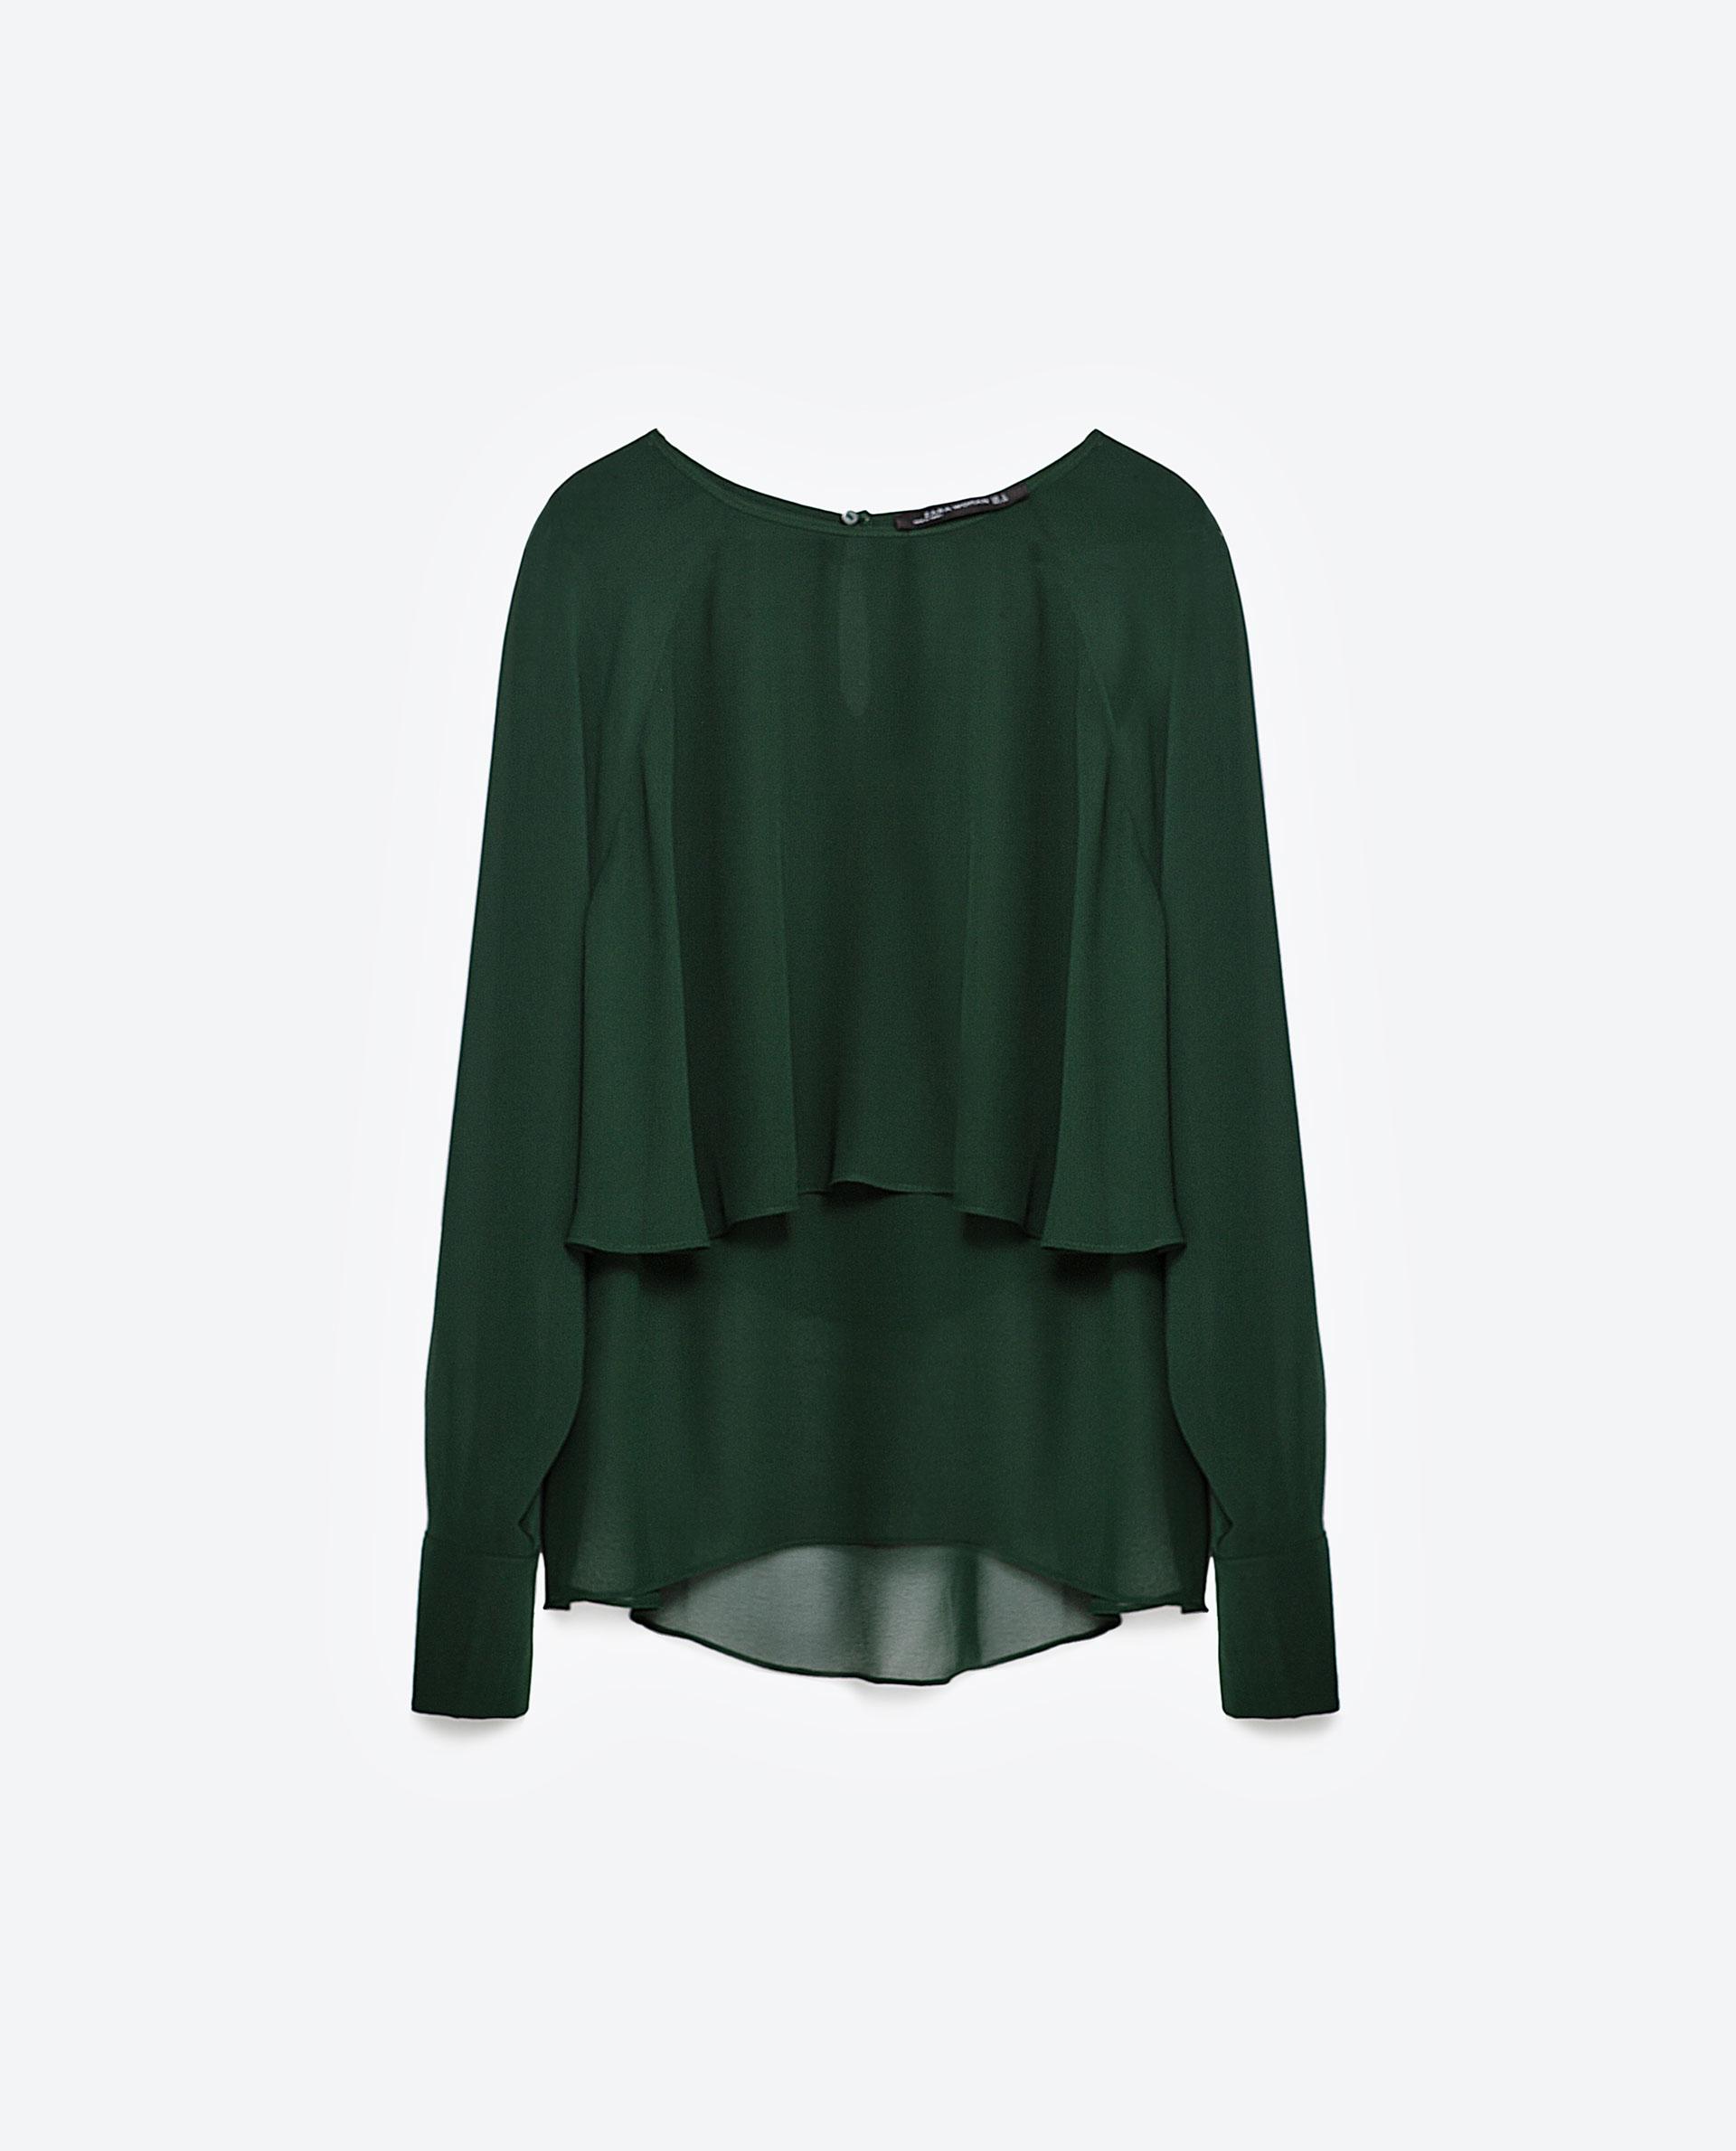 Zara Green Blouse 51